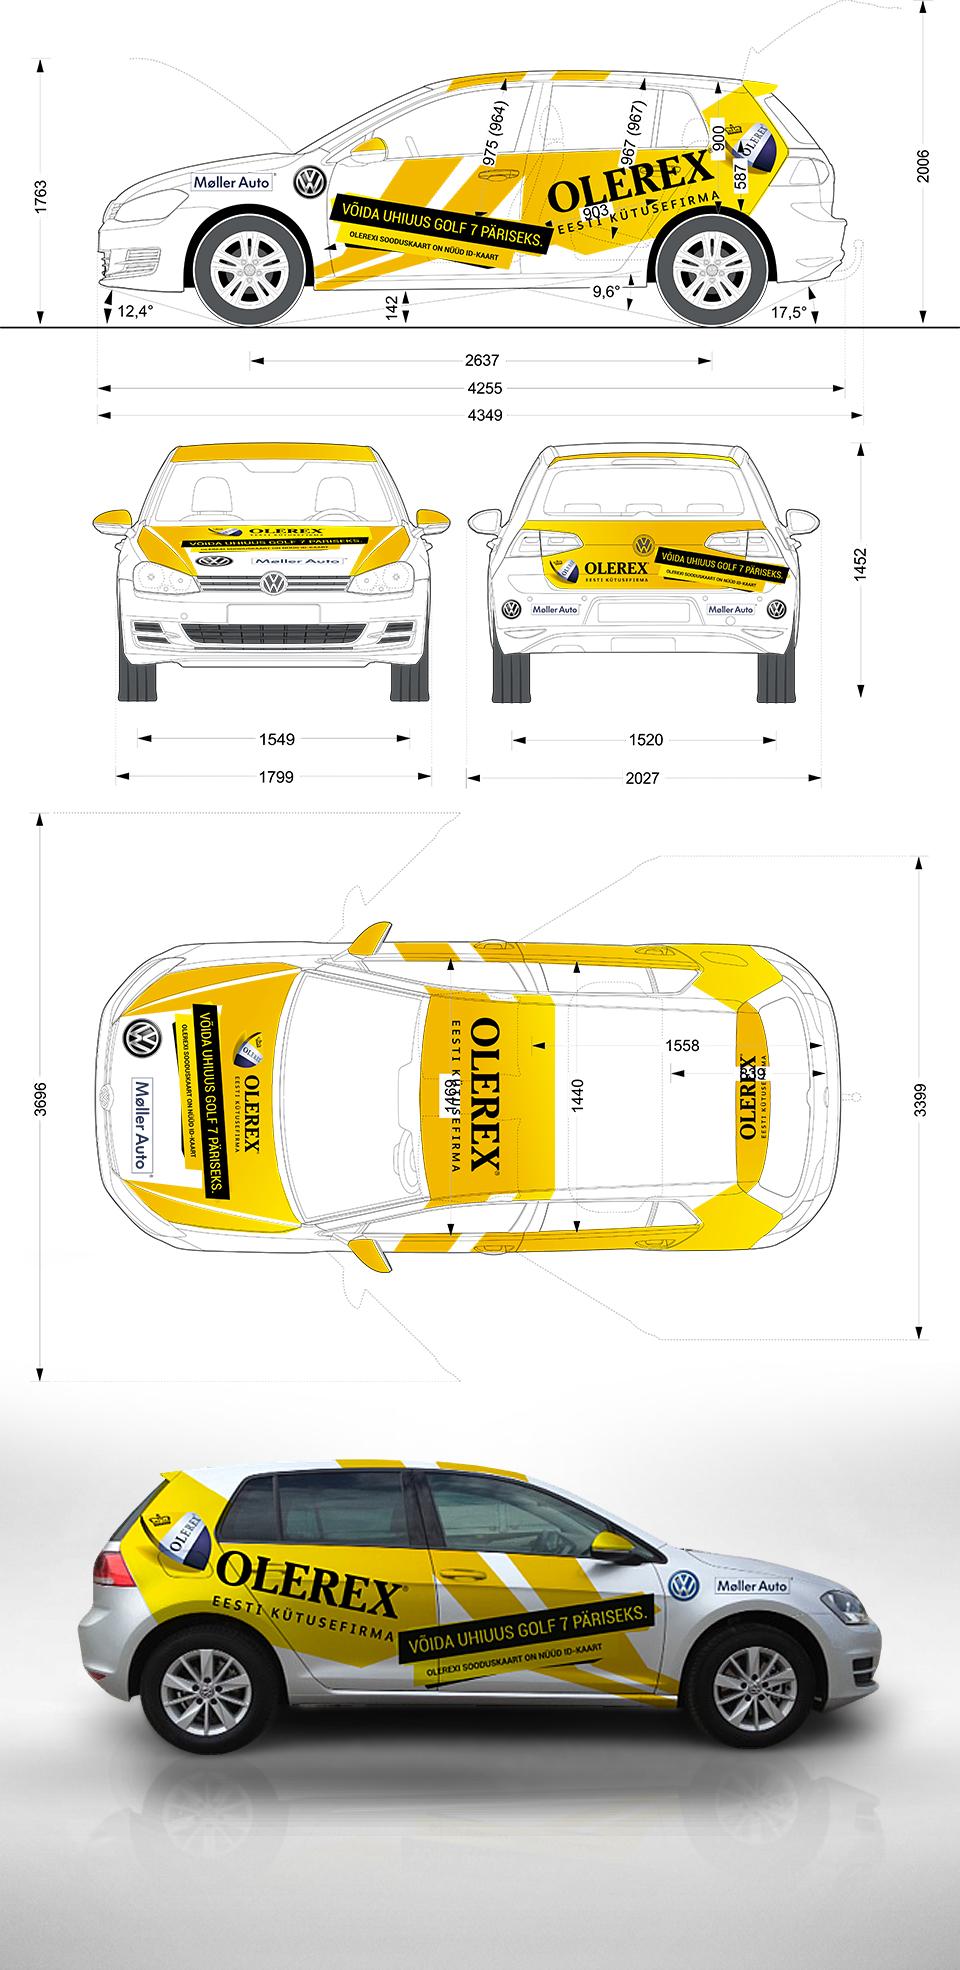 Cars-Olerex-VWGolf